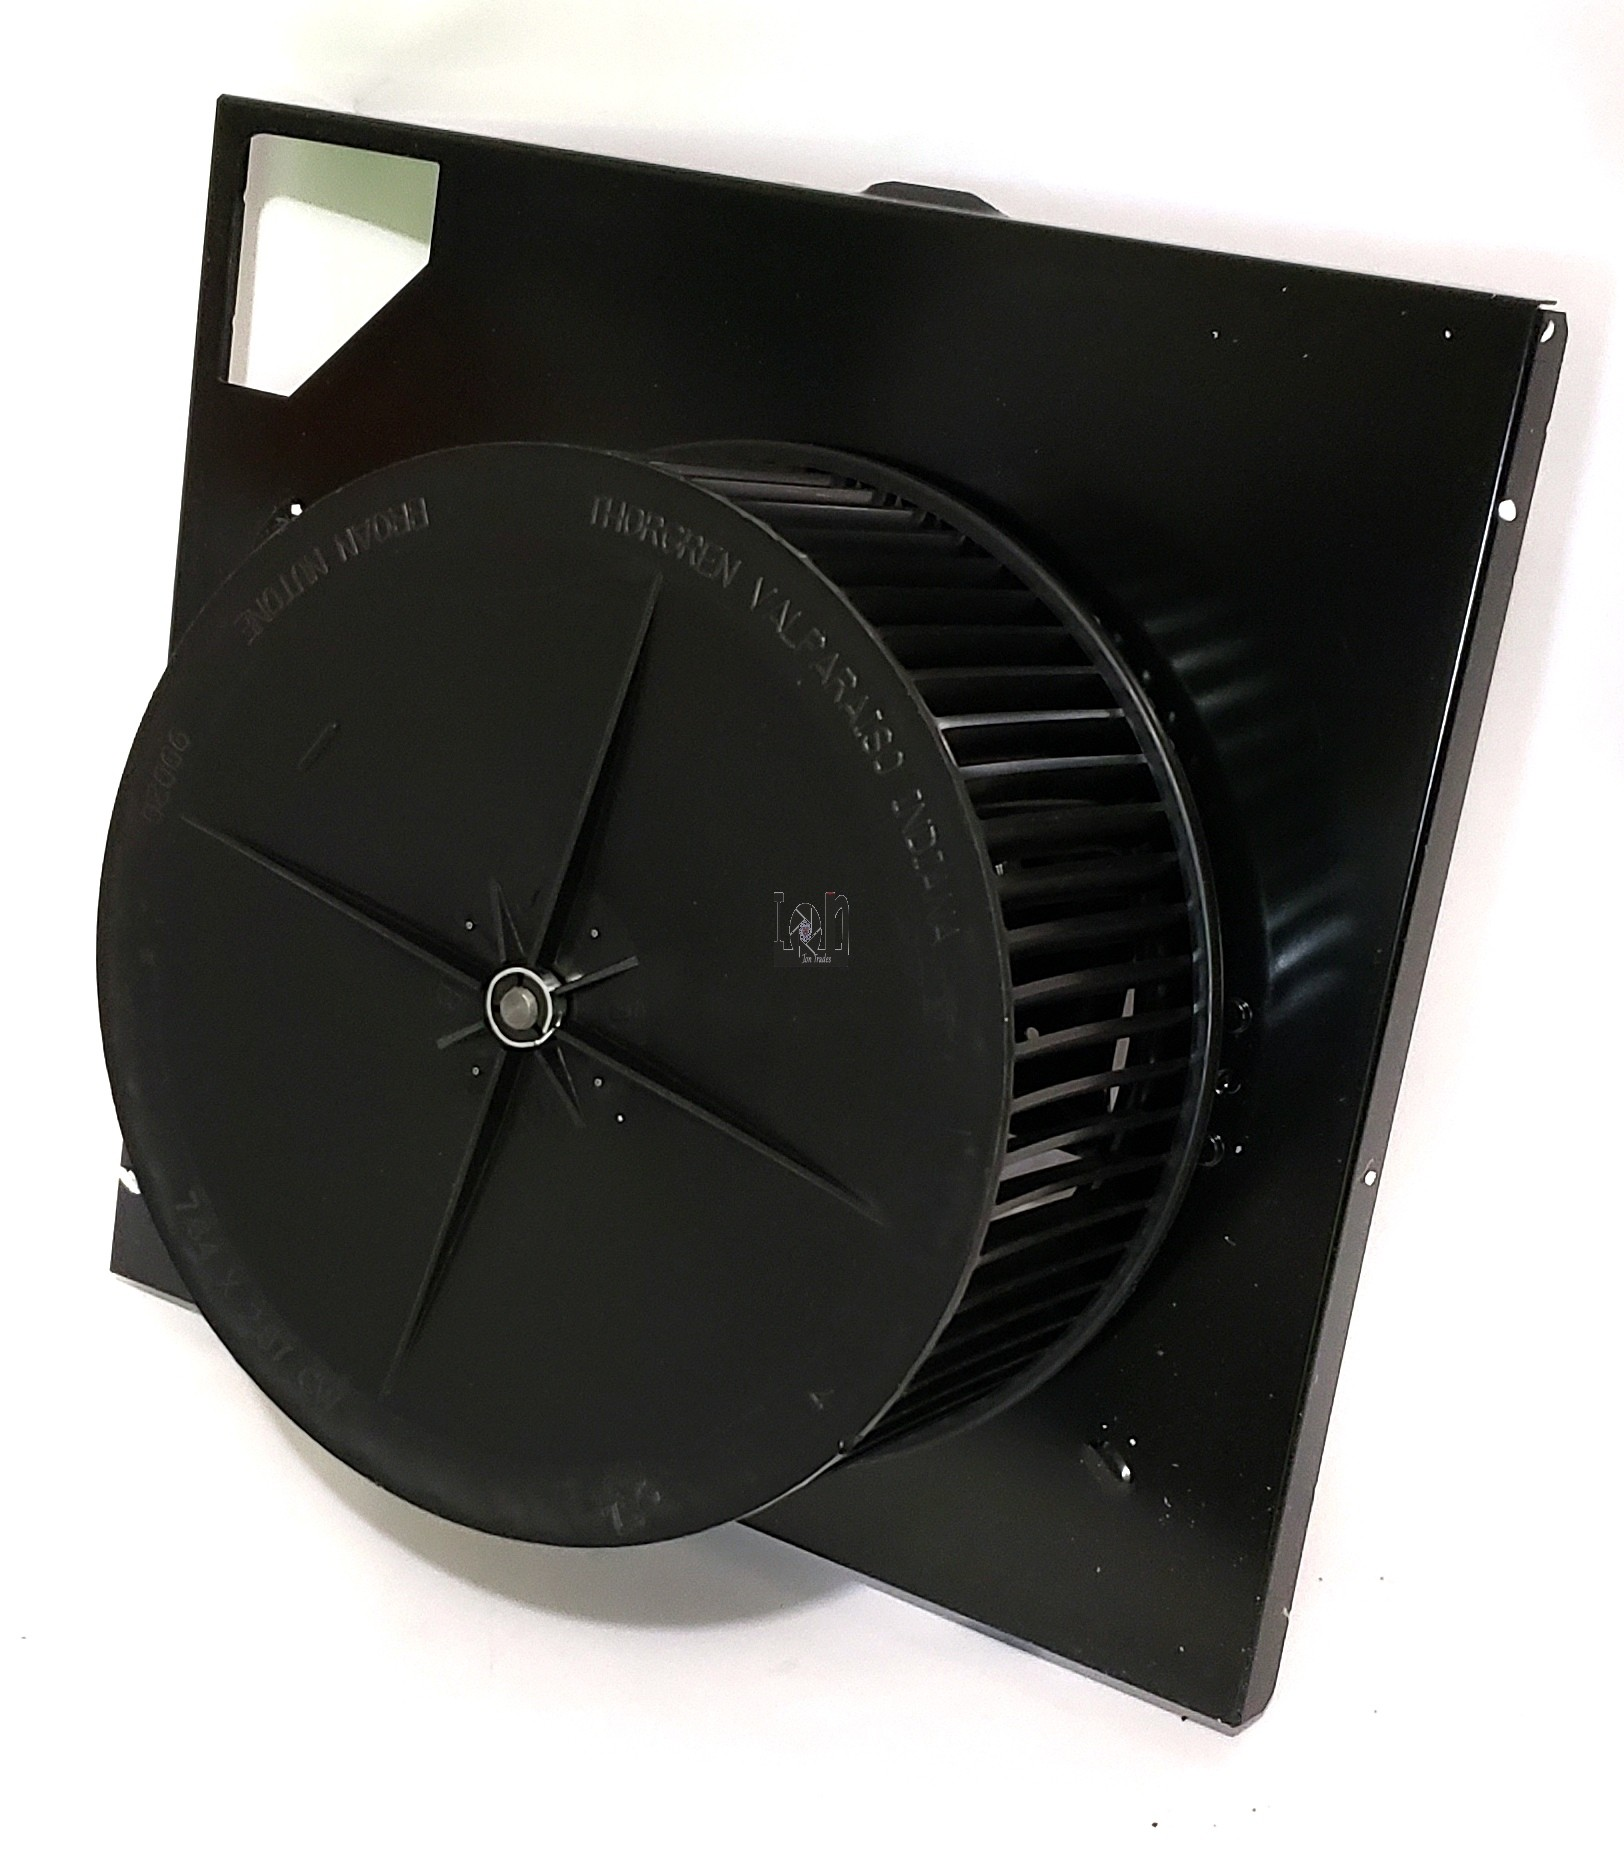 Broan Nutone Blower Fan Motor Assembly S97016621 QTR070 QTR080